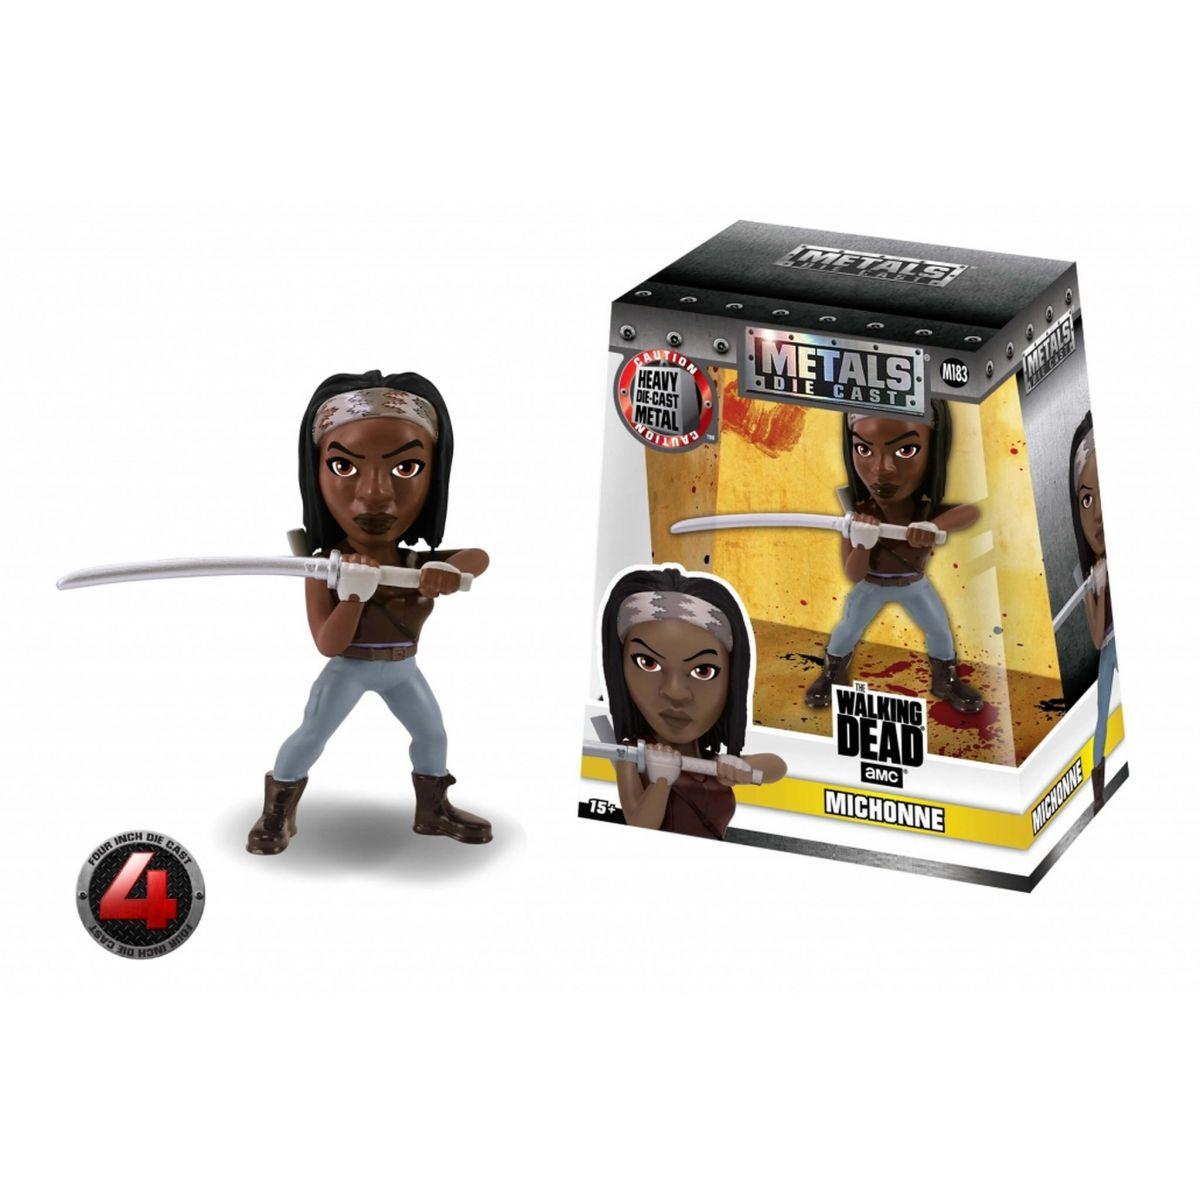 Metals Die Cast Michonne: The Walking Dead (M183) - DTC